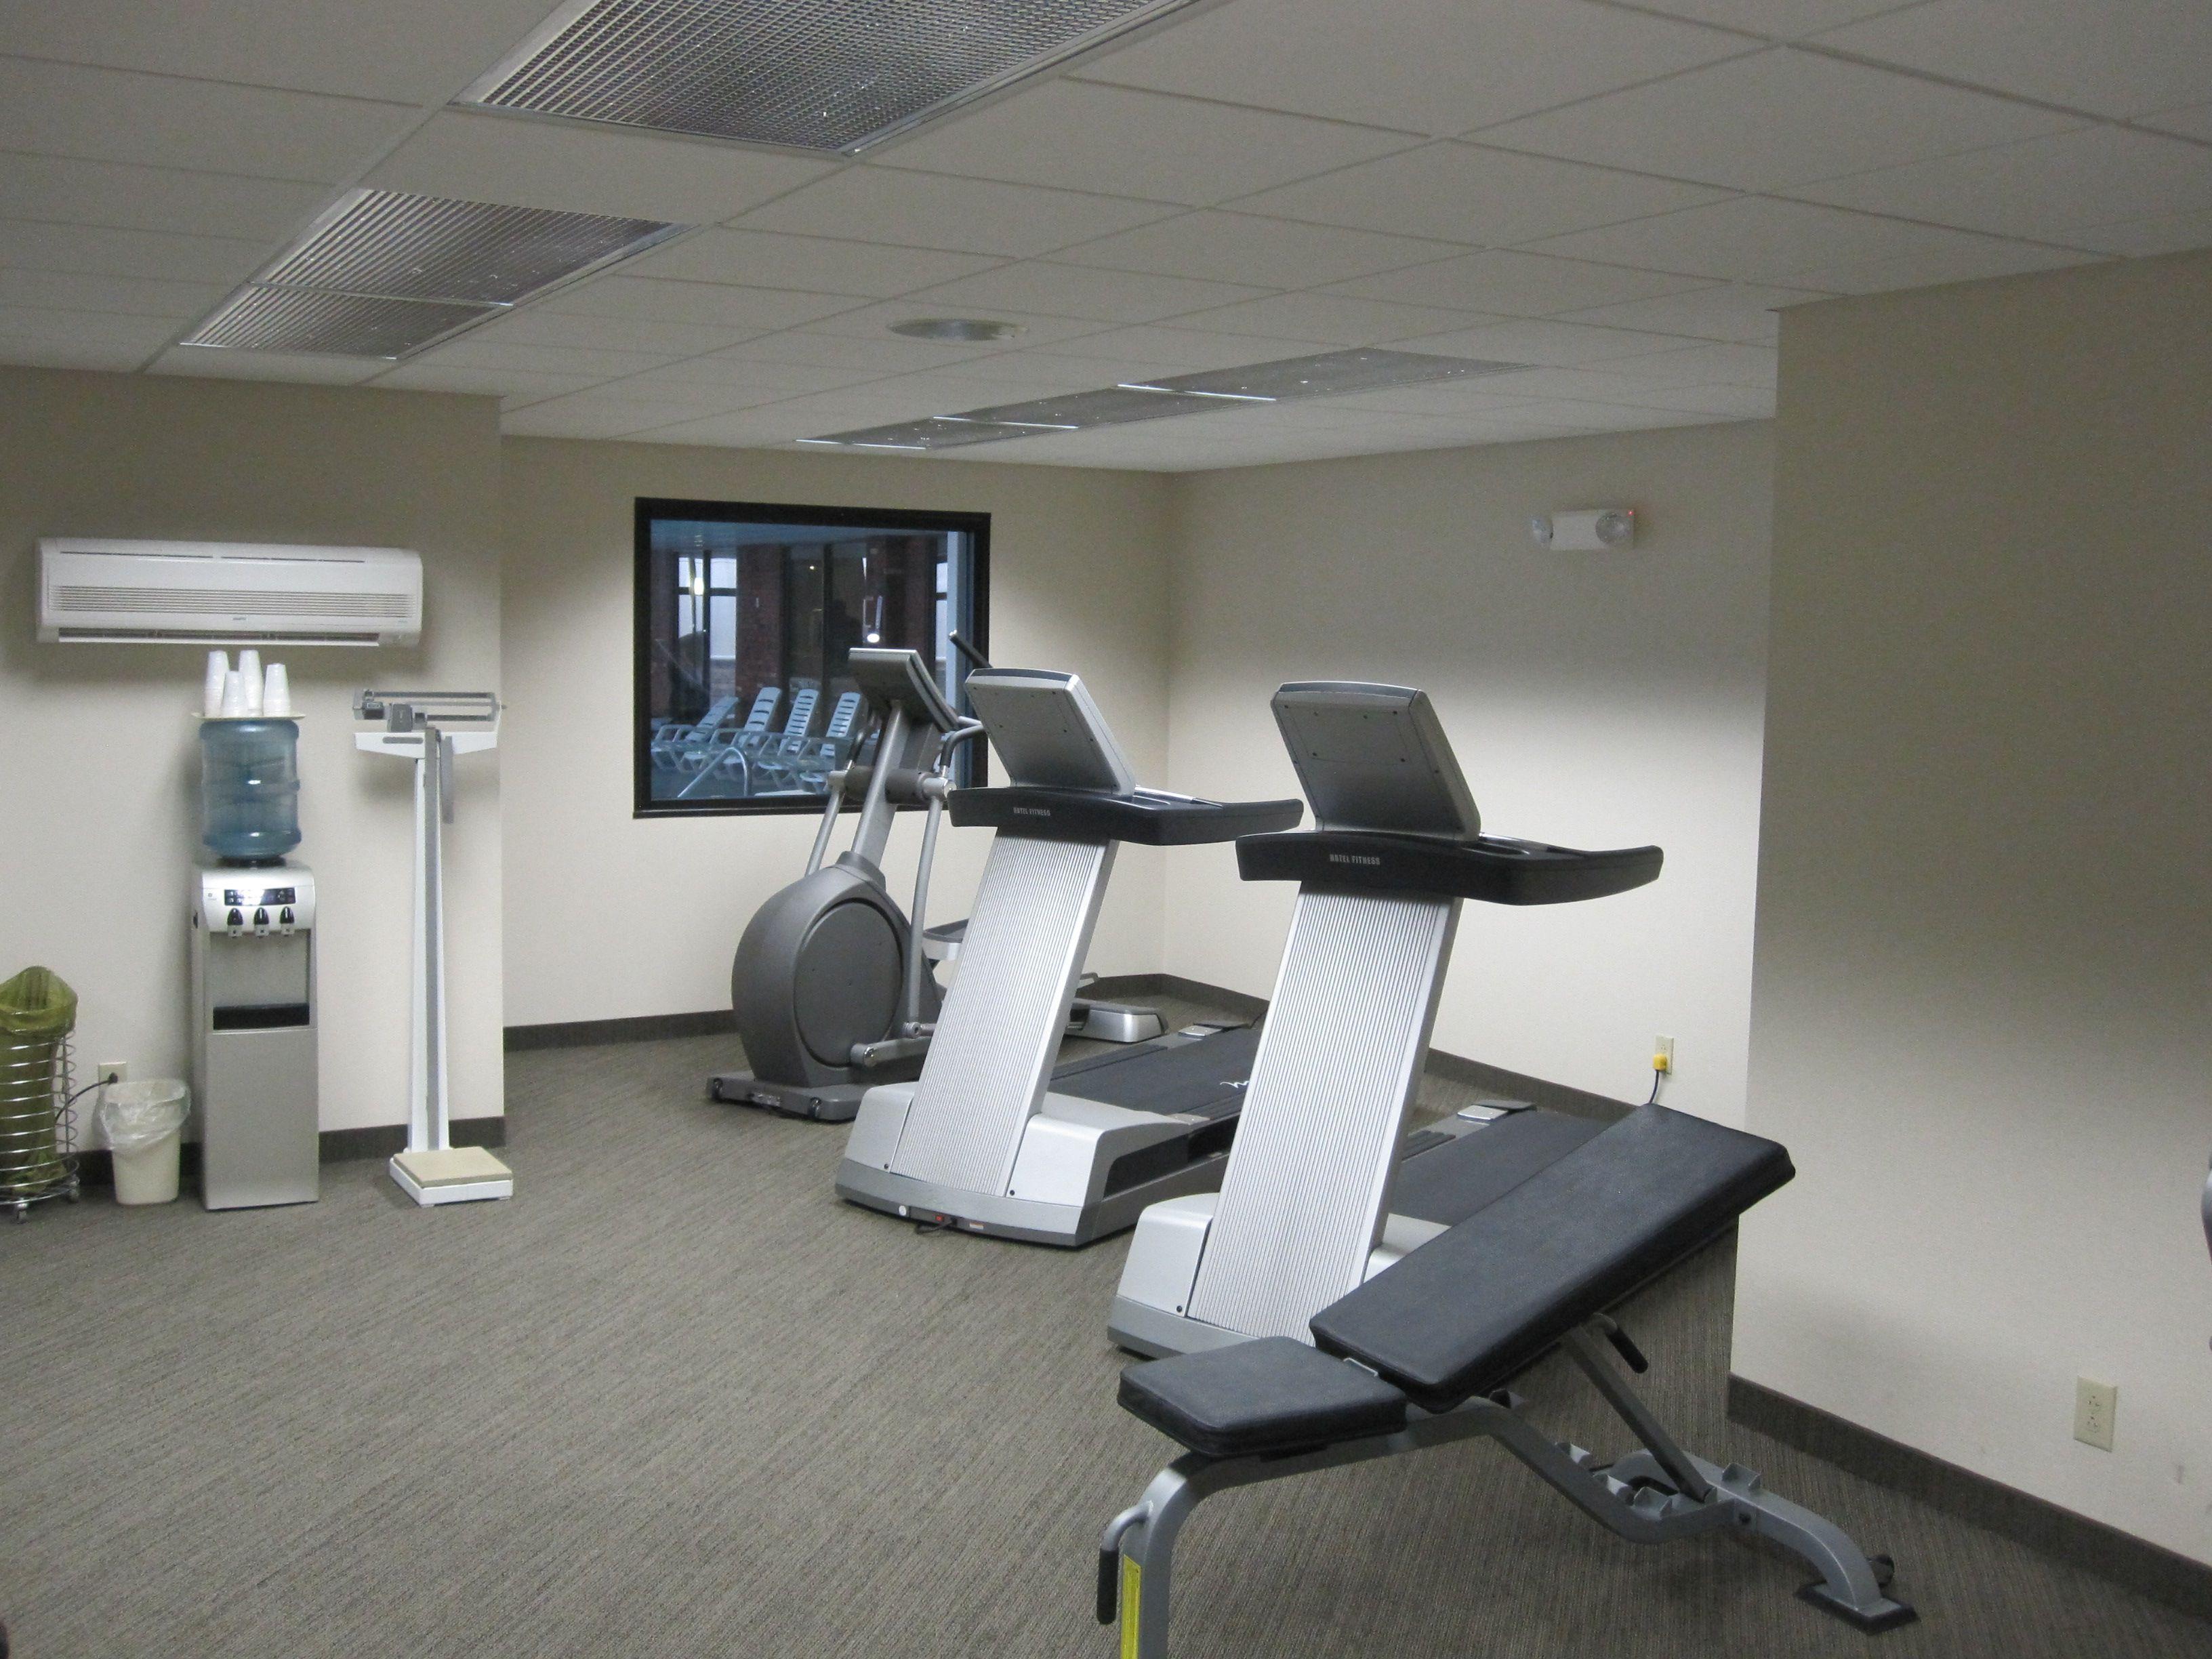 Fitness Center Holiday Inn Elmira Fitness Center Holiday Inn Hotel